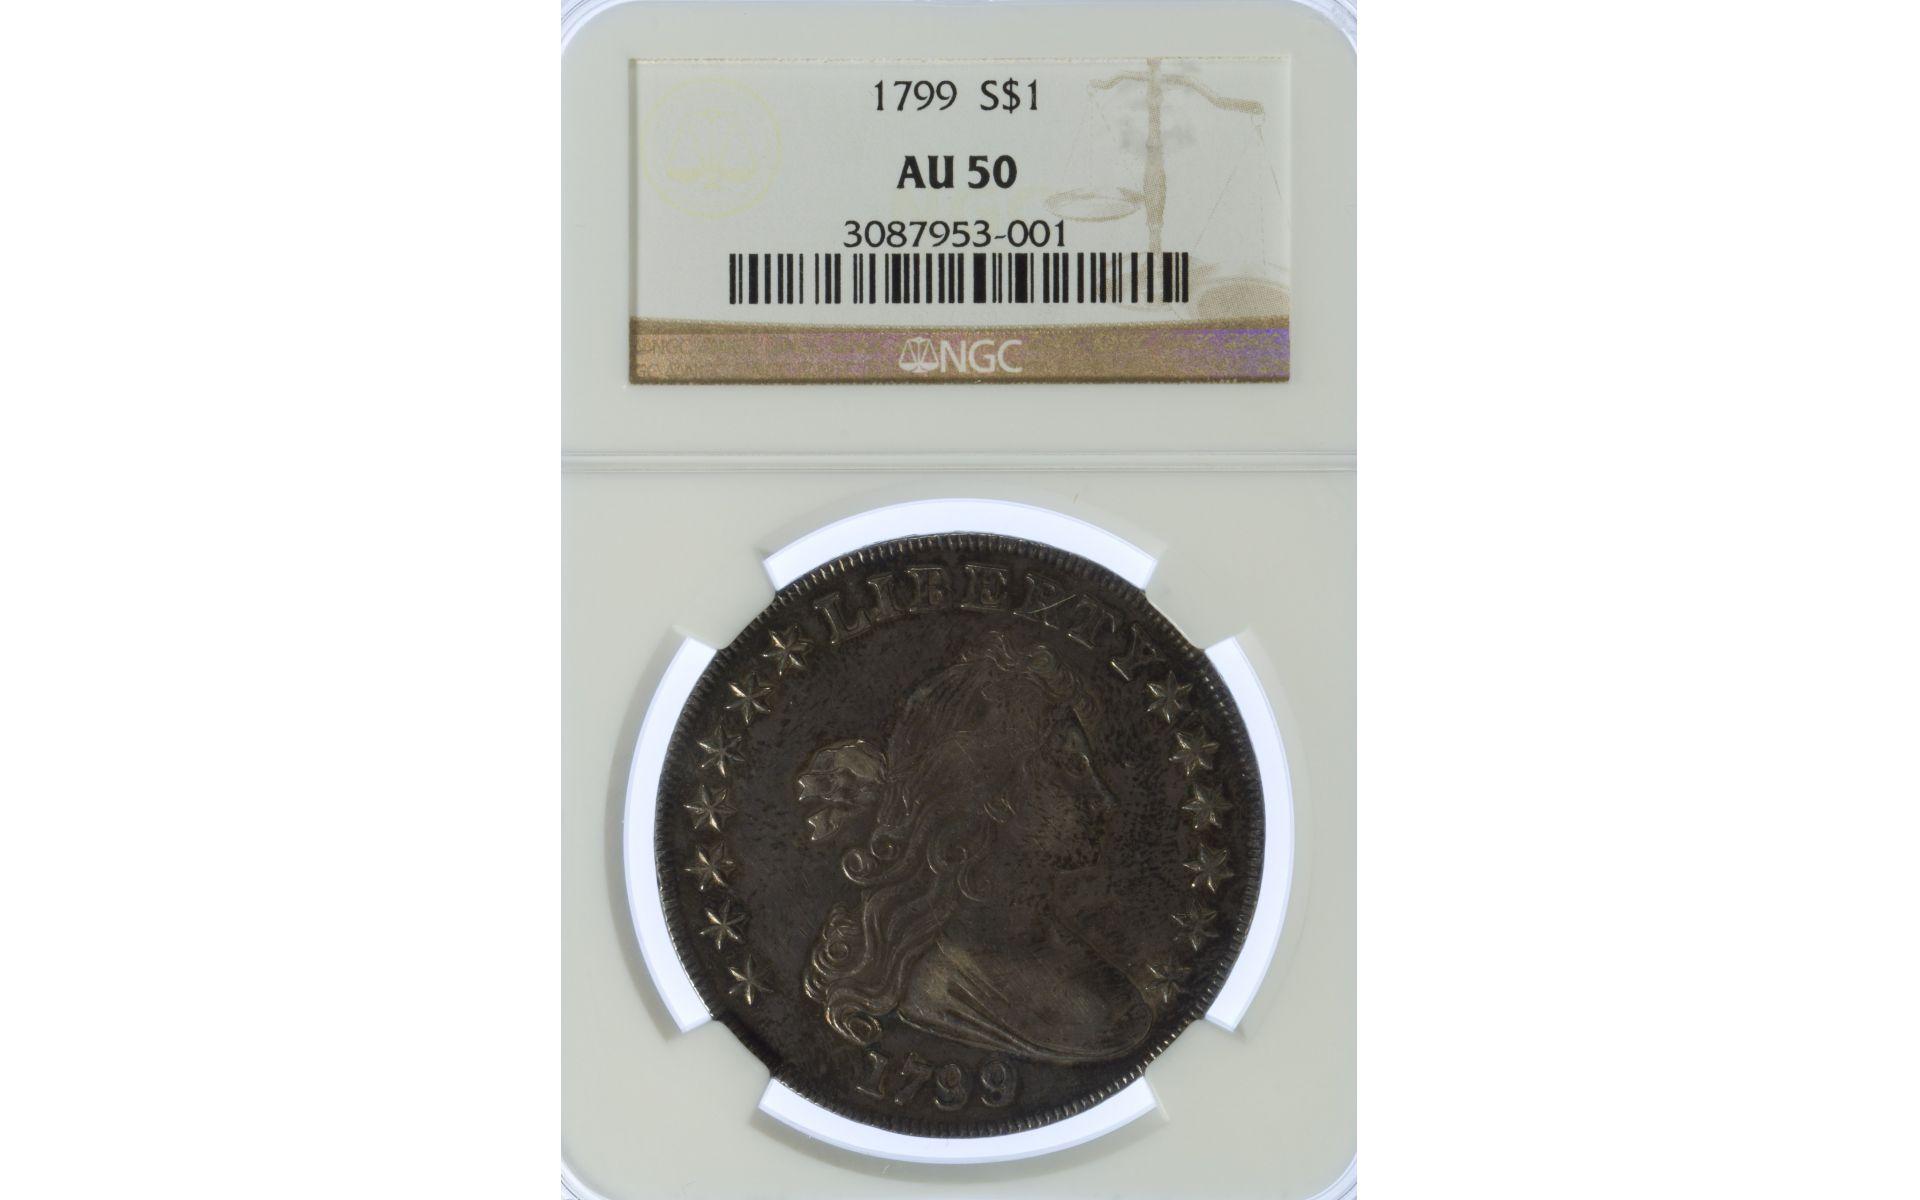 Premiere Coin & Currency Auction Catalog #130 | Leonard Auction